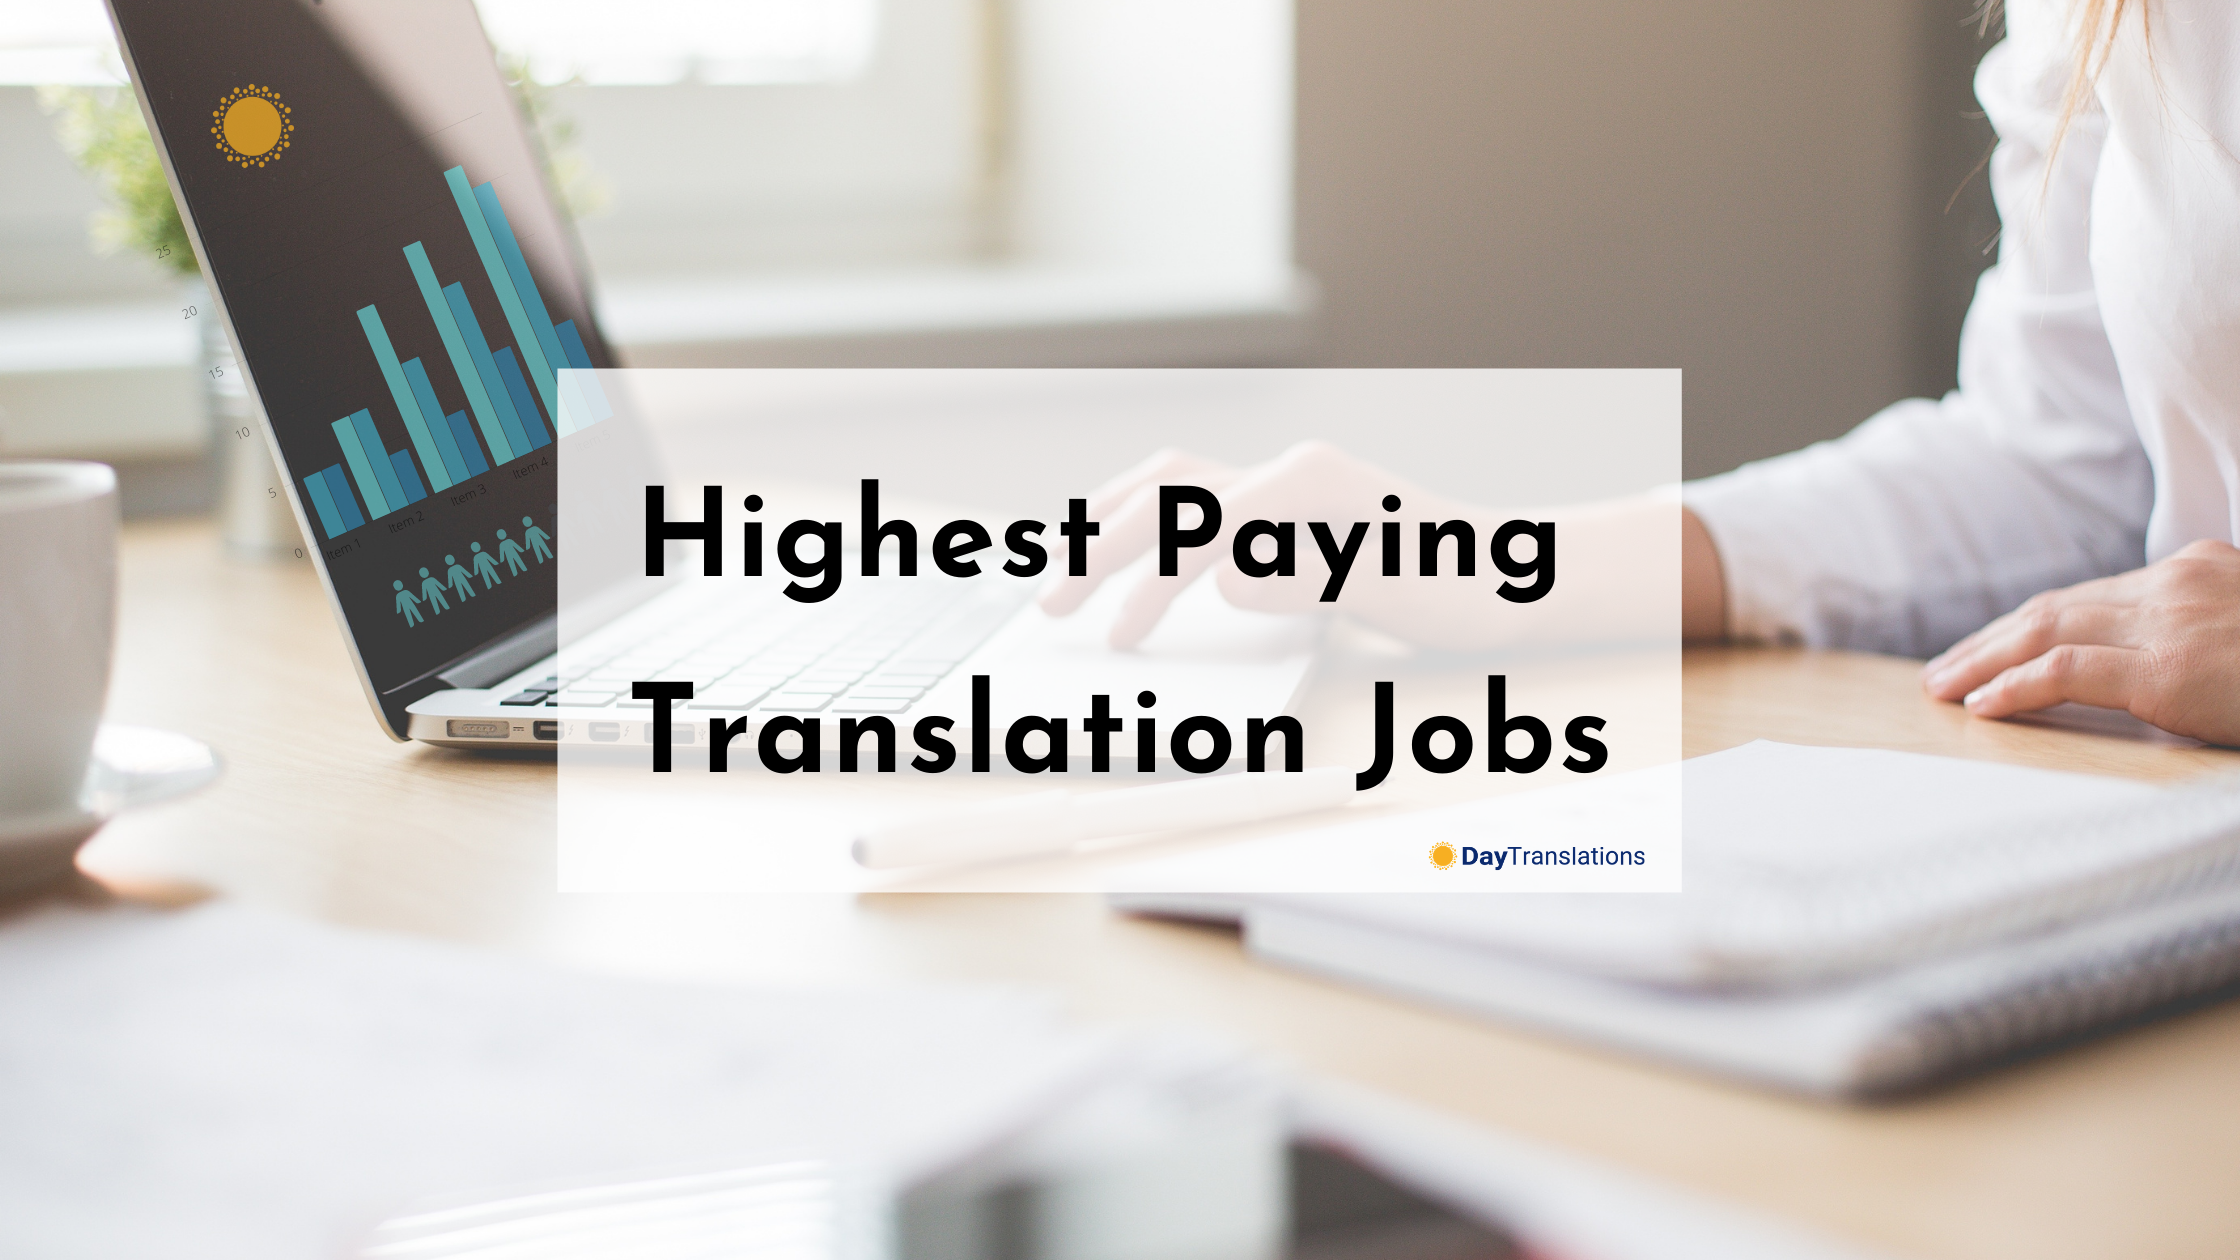 Highest Paying Translation Jobs